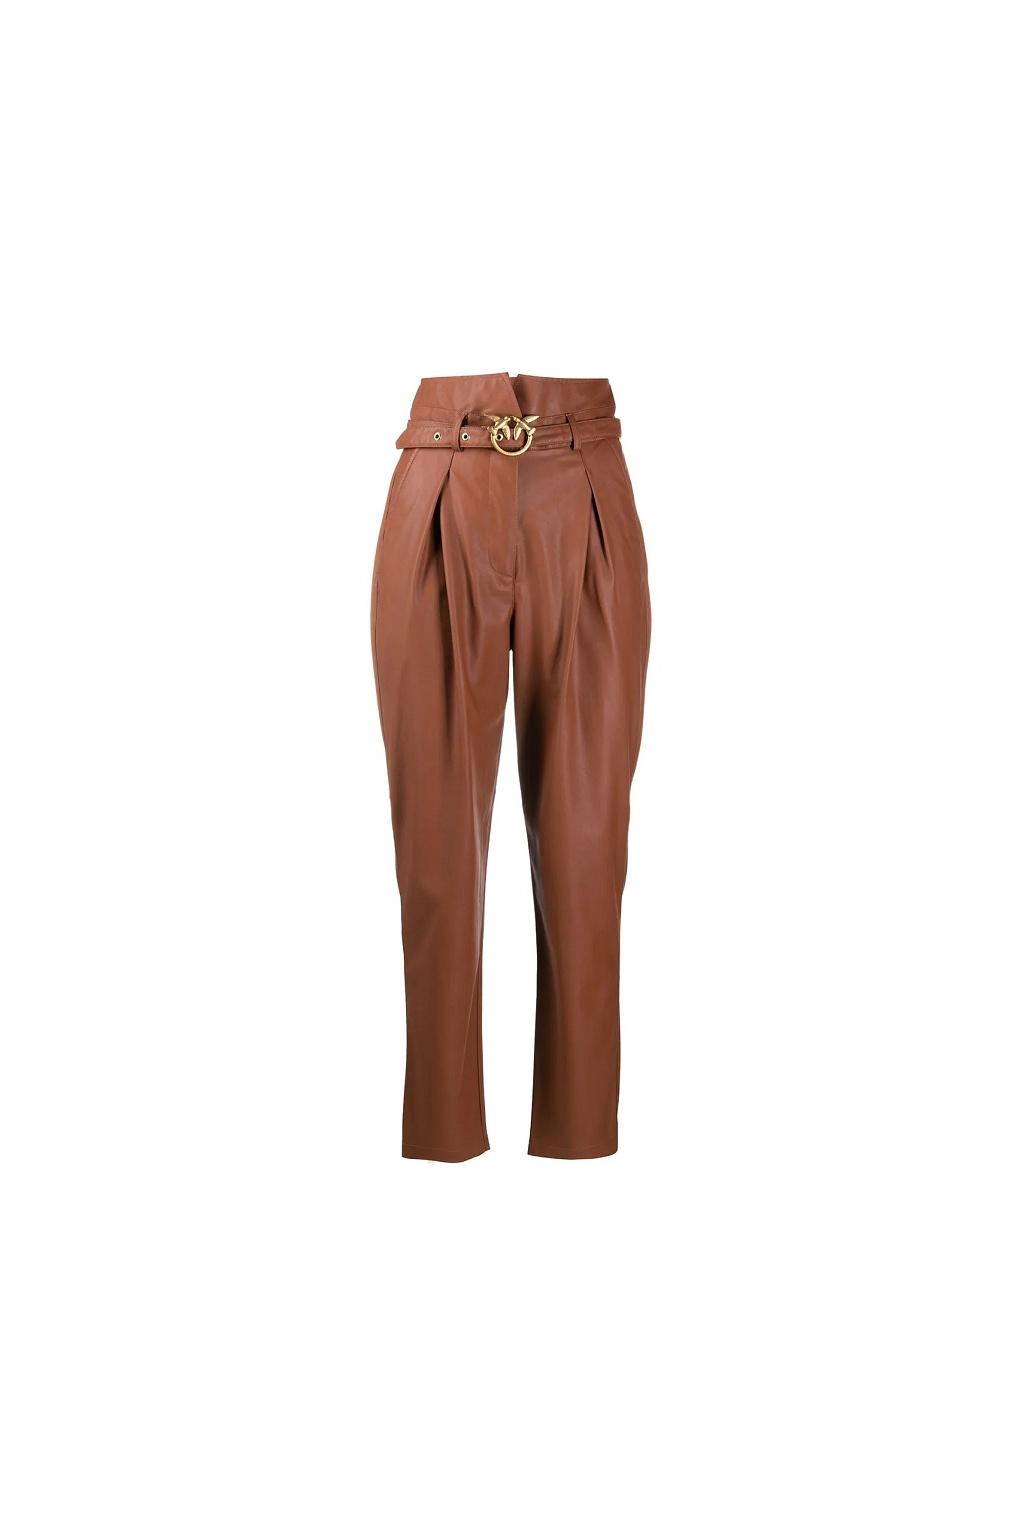 1N12V0 7105 Dámské kalhoty Pinko Aurelio hnědé